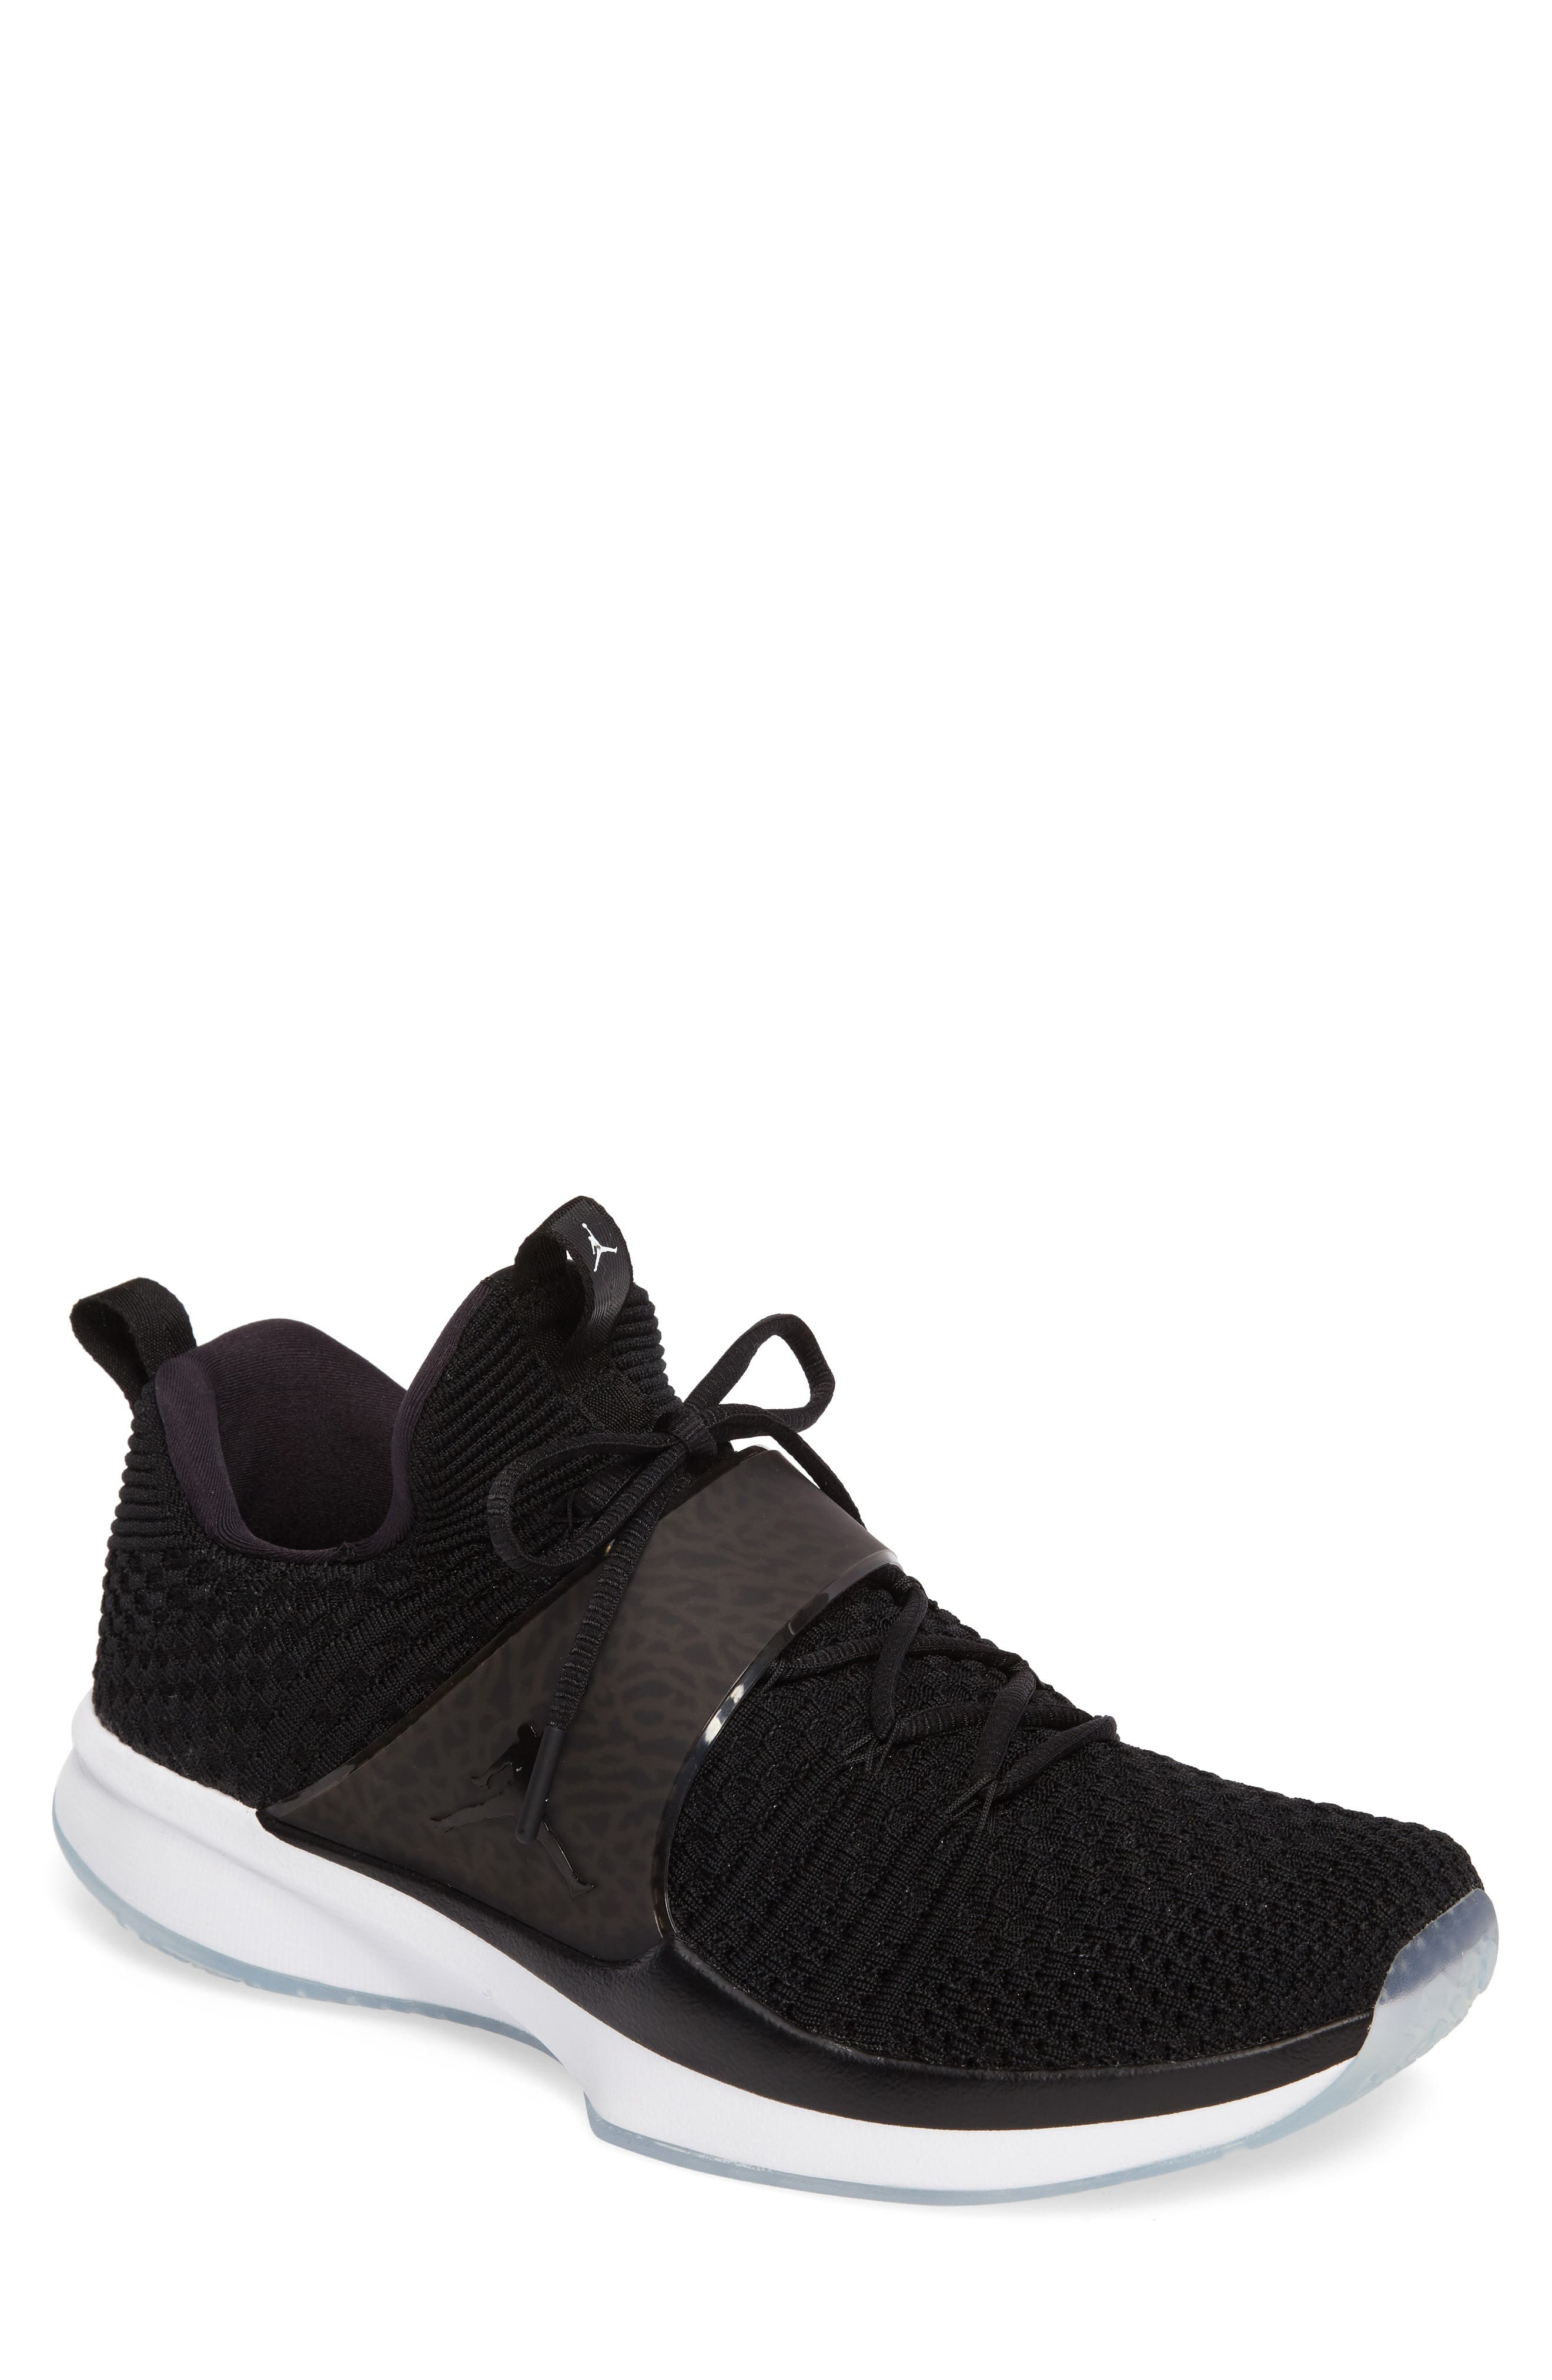 Jordan Flyknit Trainer 2 Low Sneaker,                             Main thumbnail 1, color,